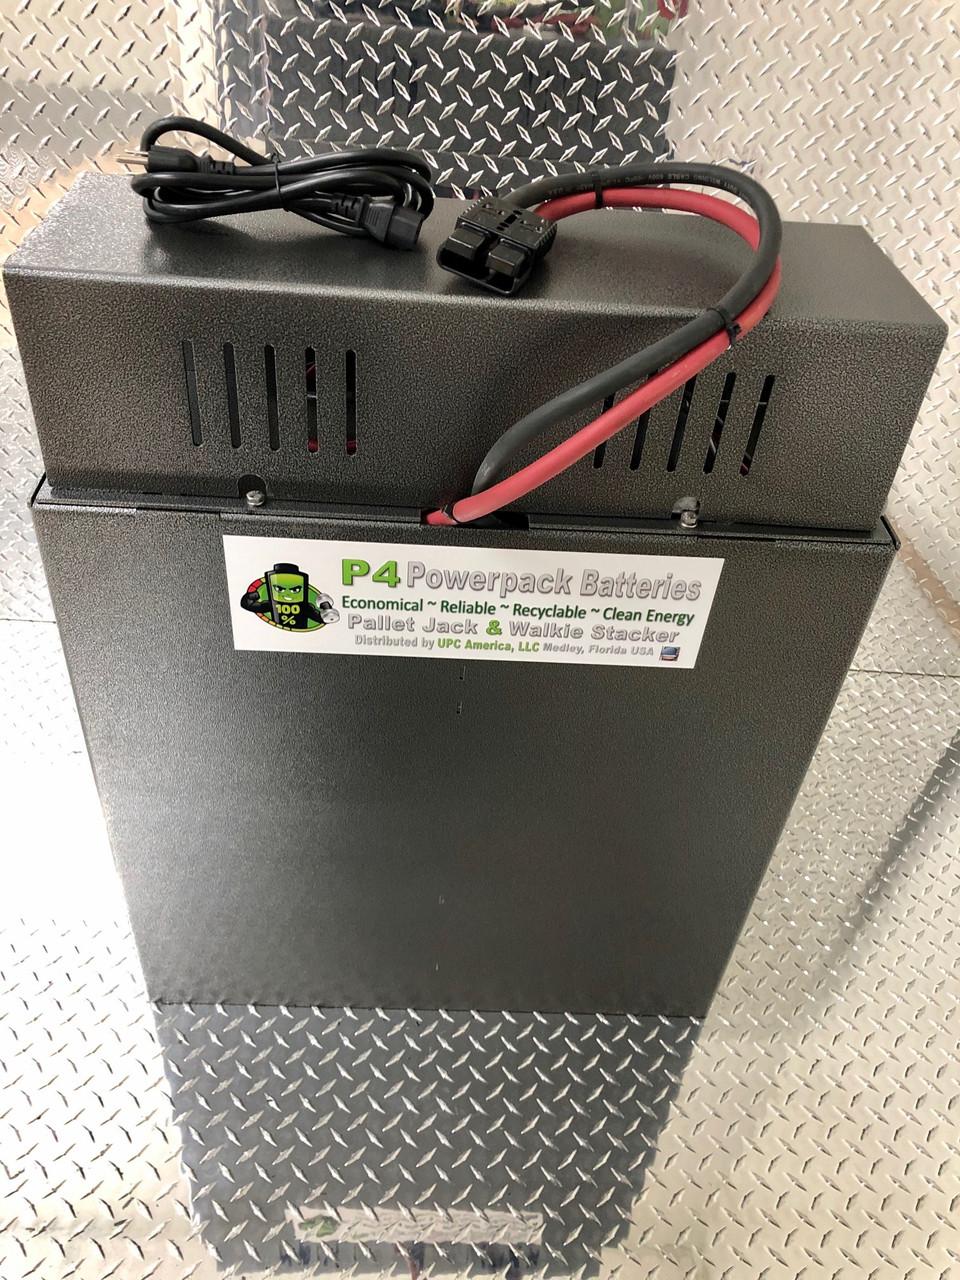 Pallet Jack battery